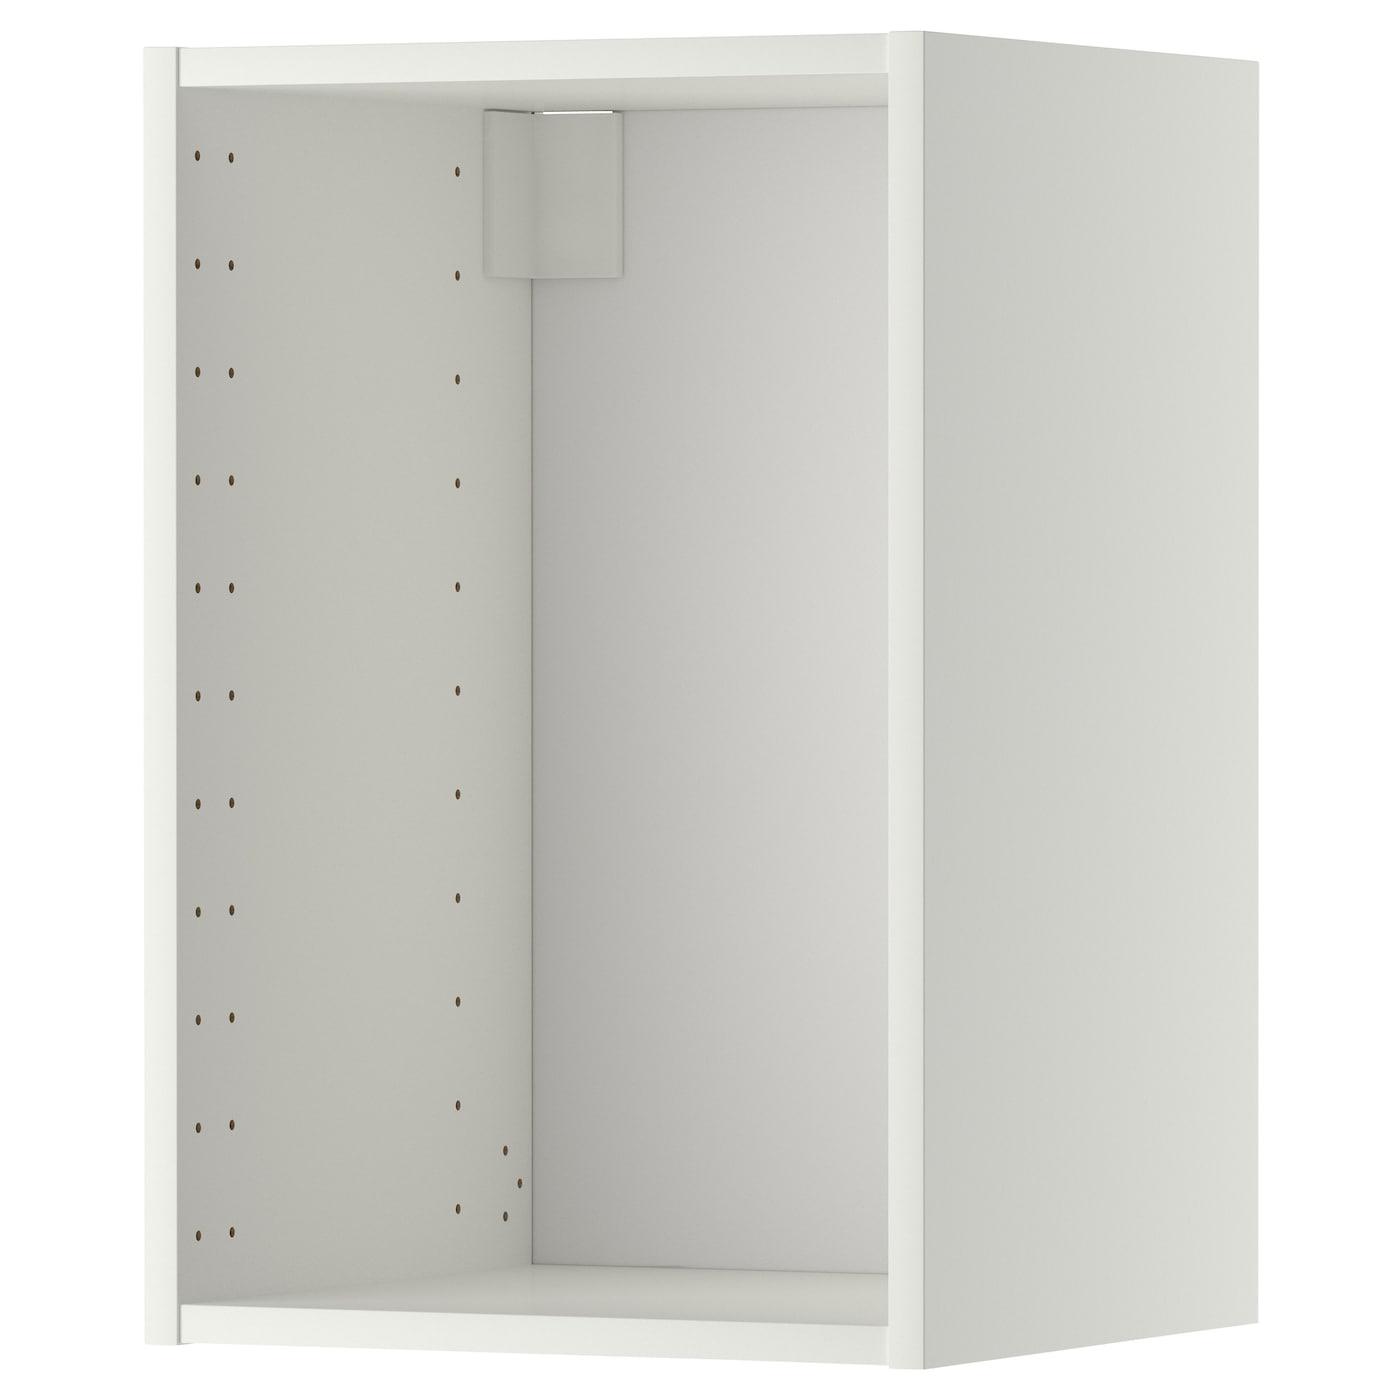 Metod White Wall Cabinet Frame 40x37x60 Cm Ikea